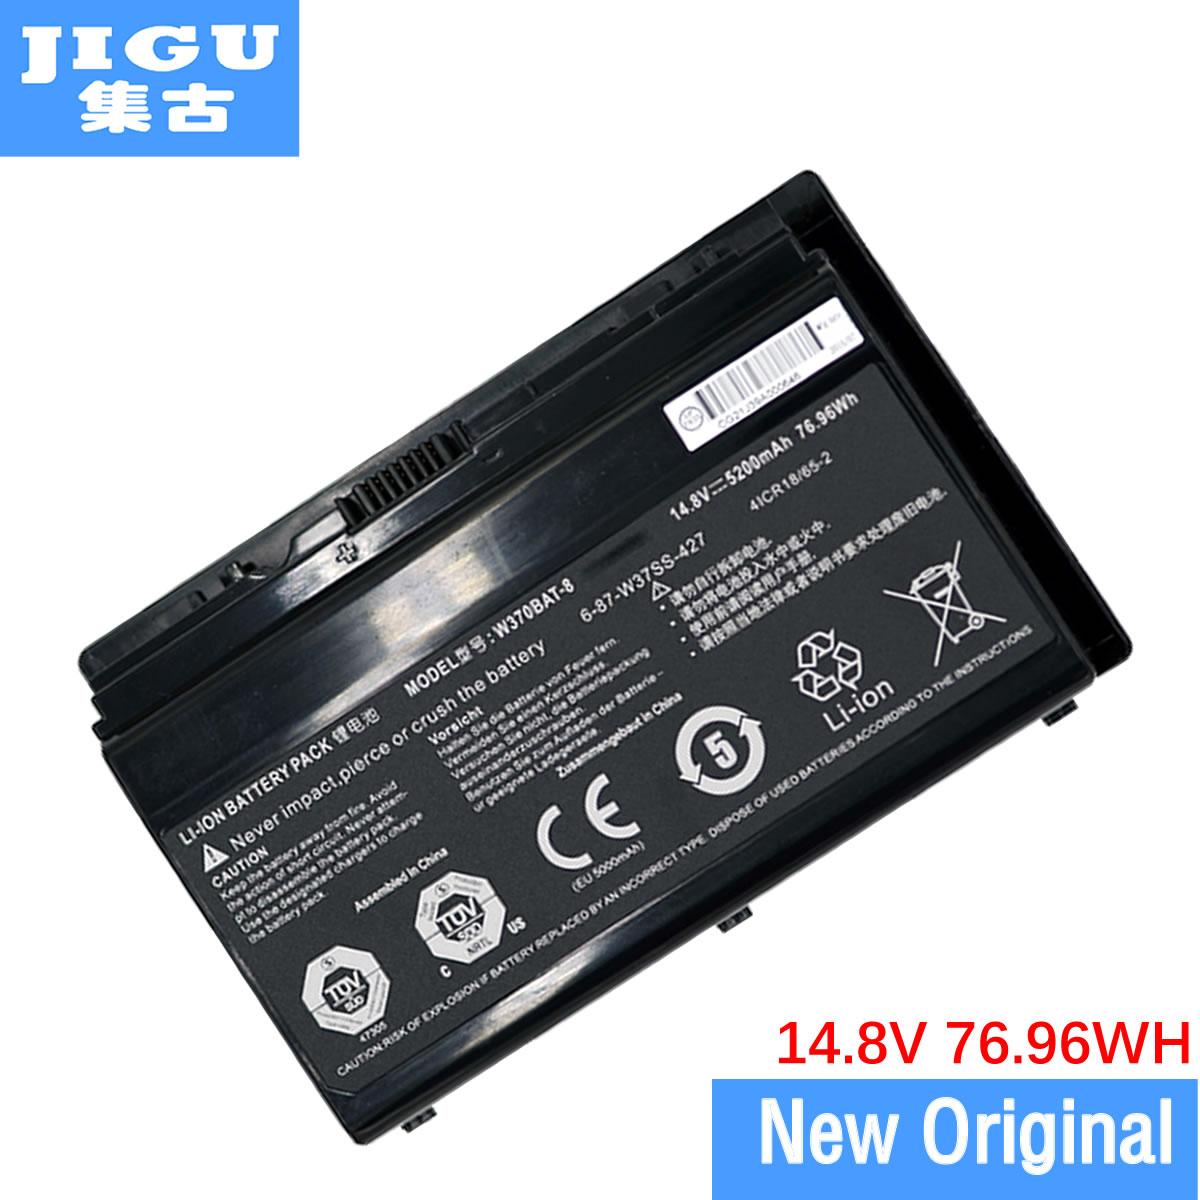 JIGU Laptop Battery 6-87-W370S-427 6-87-W370S-4271 FOR CLEVO K590S K790S NEXOC. G508II NP6350 NP6370 p370em W350ET W350ETQ 89wh clevo p870bat 8 laptop battery 6 87 p870s 4273 6 87 p870s 4272 6 87 p870s 4271 p870dm gx9 plus